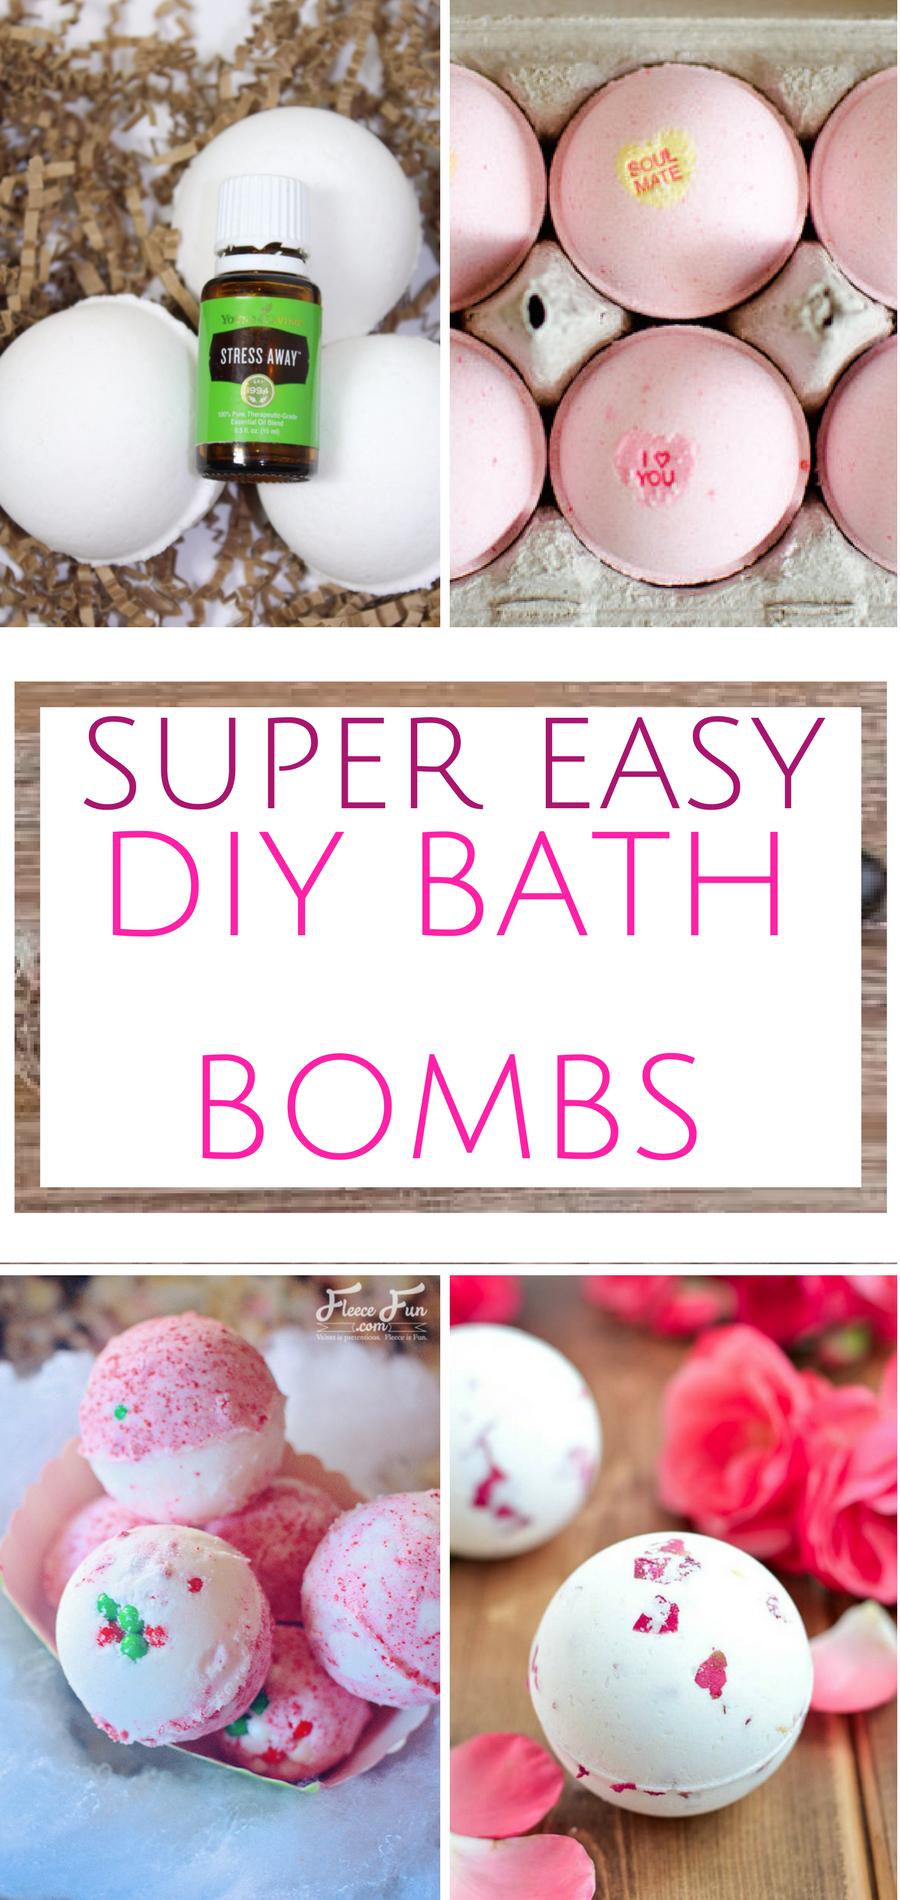 Super Easy Diy Dish Soap 3 Ingredients: Super Easy DIY Bath Bombs